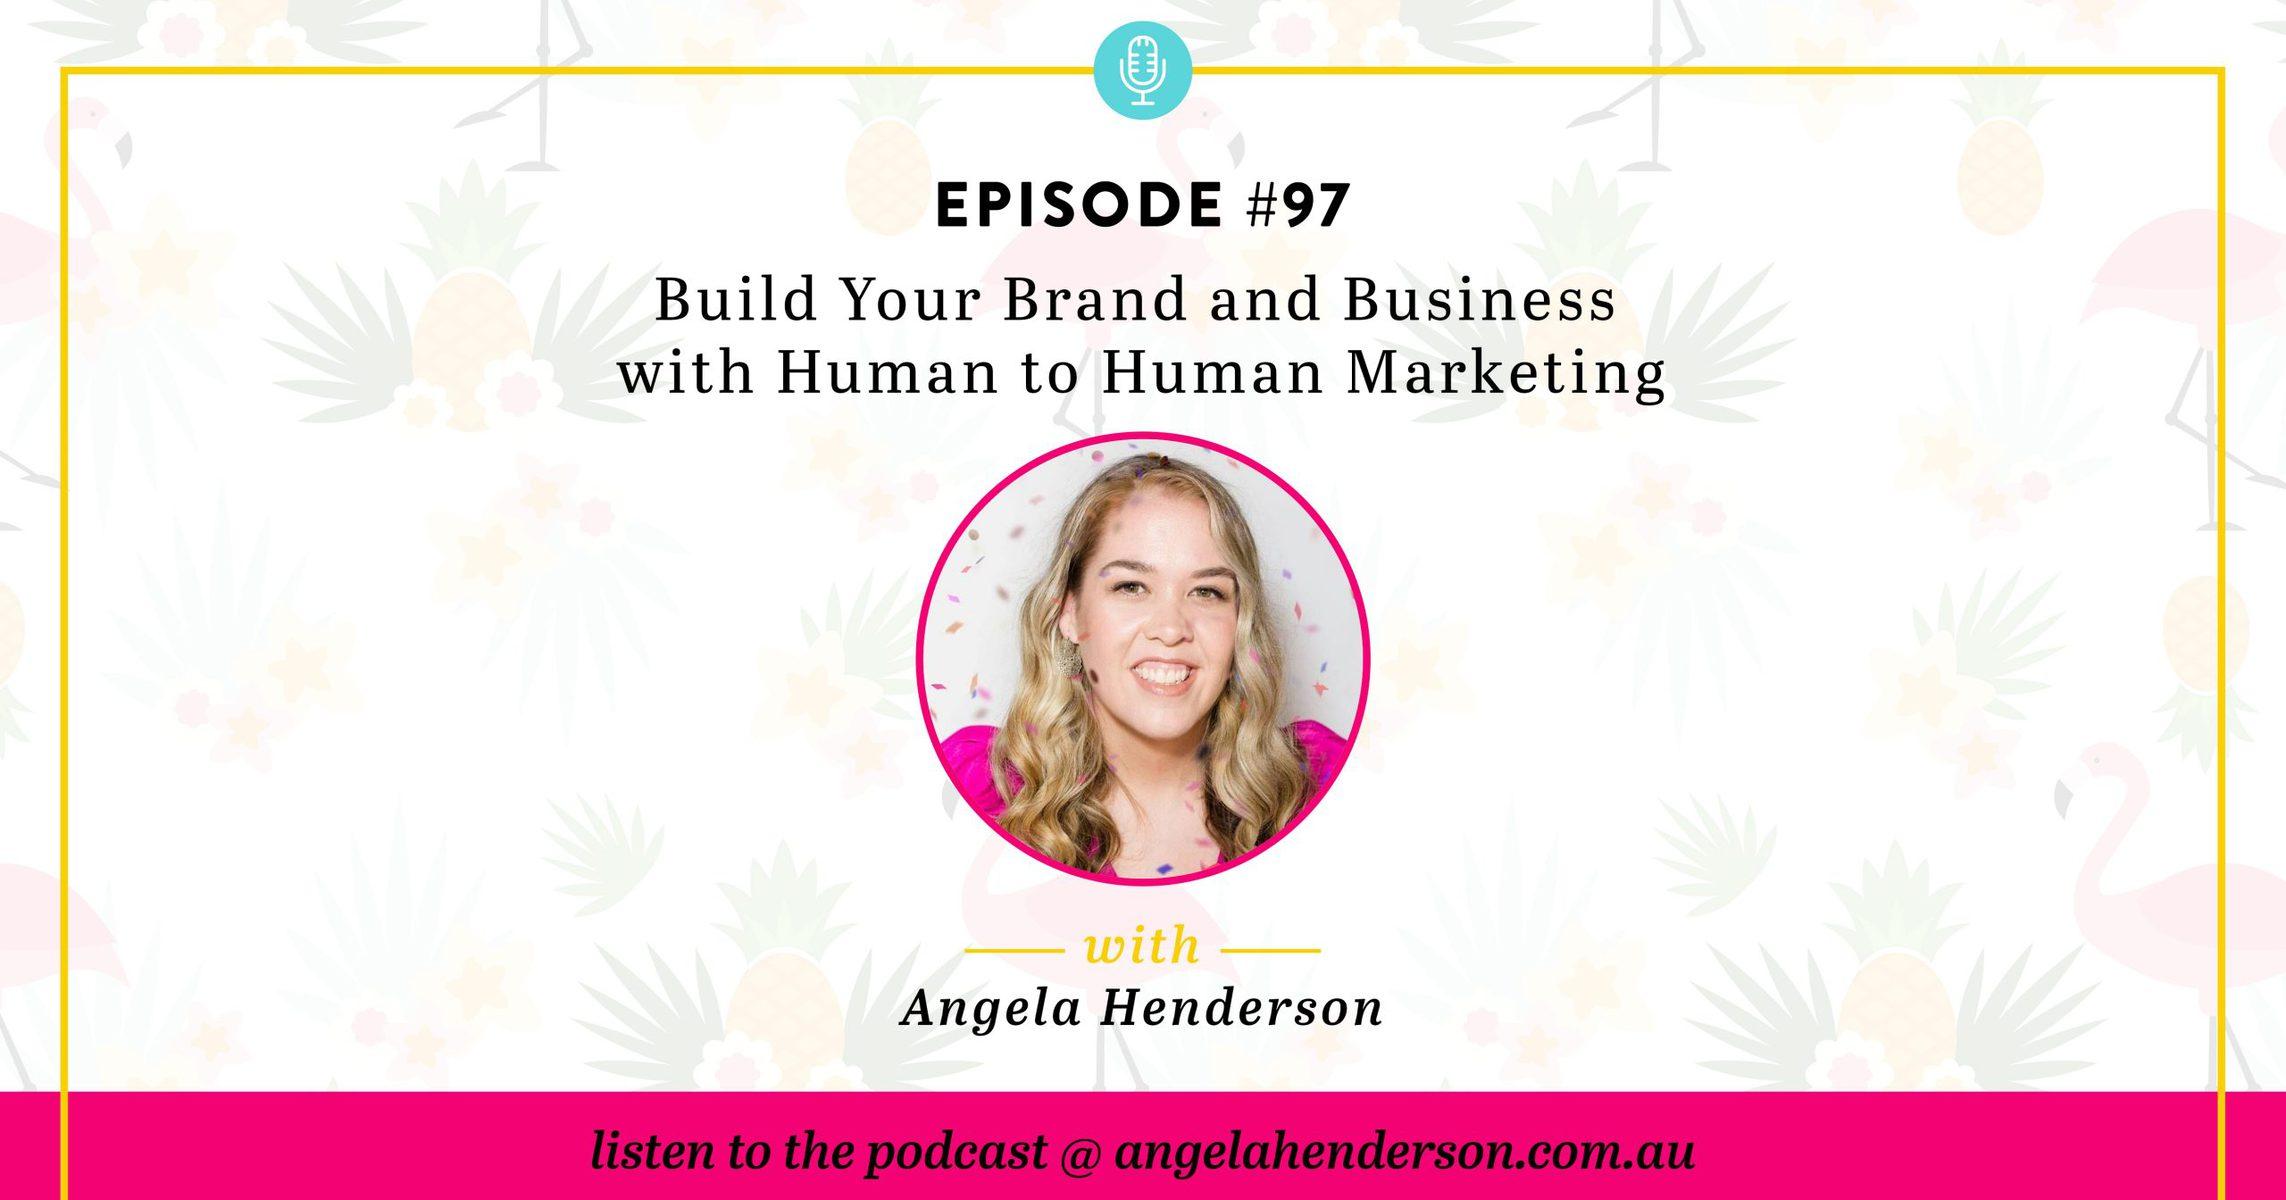 Human to Human Marketing